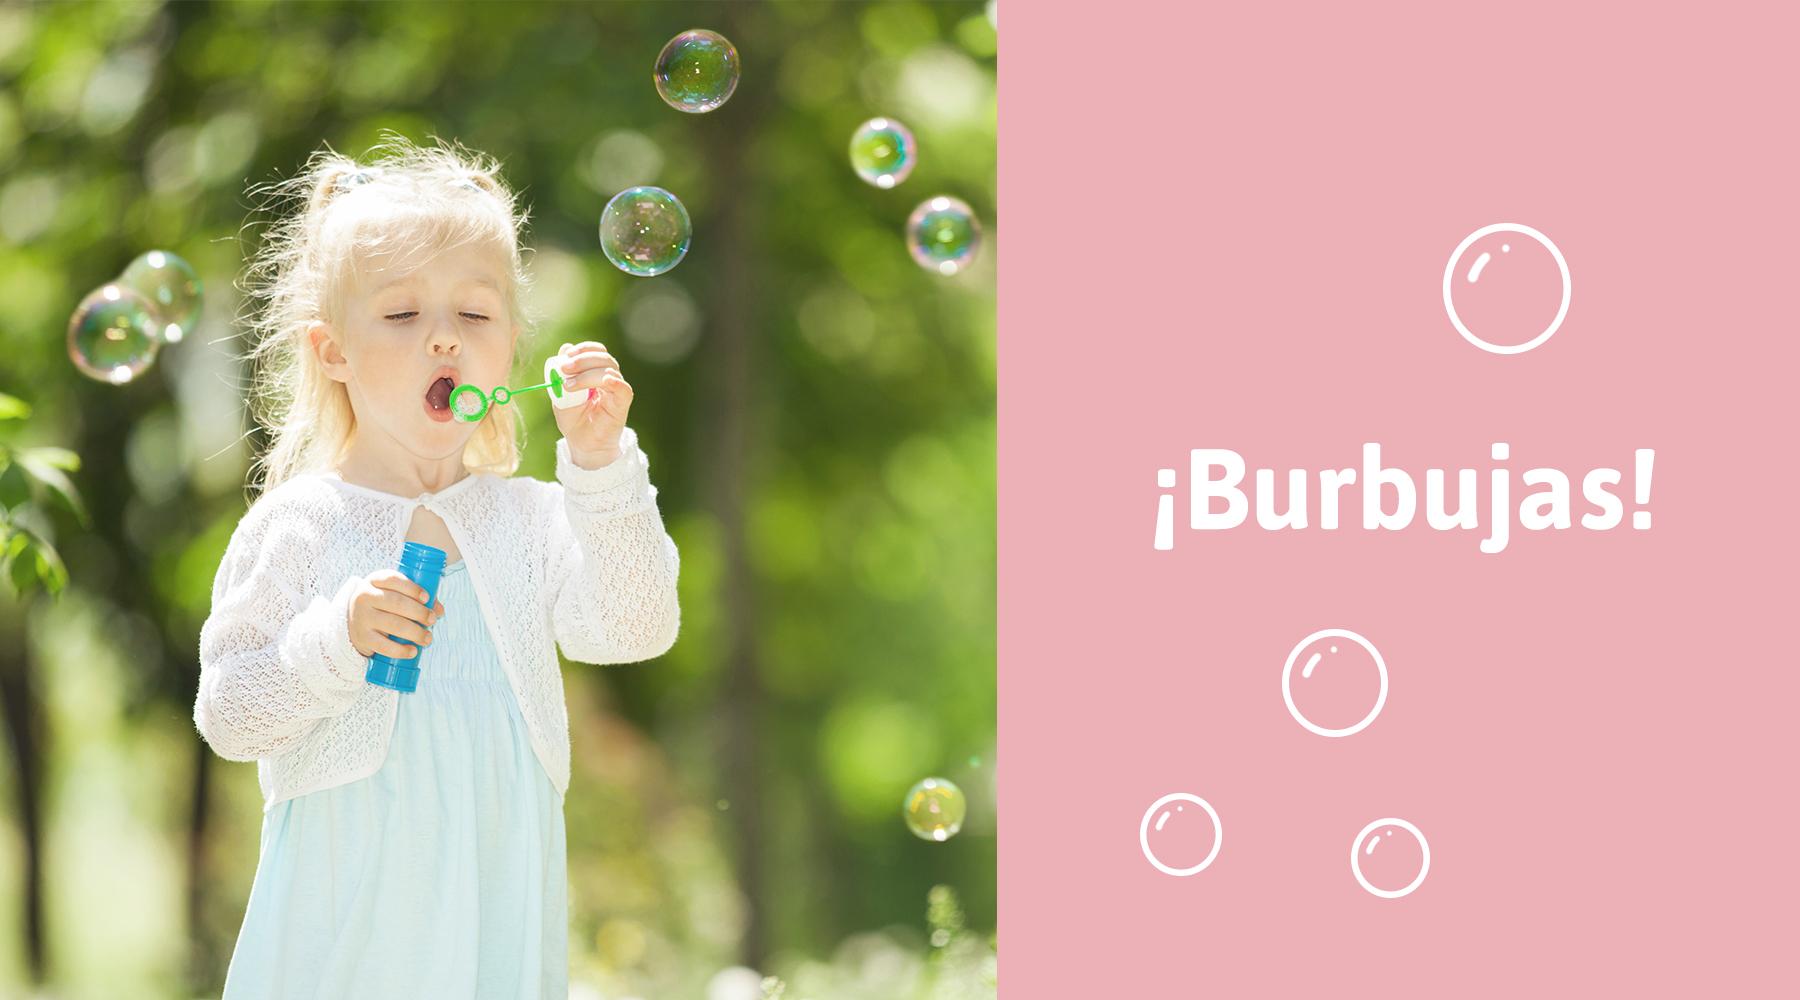 Para burbujas extra grandes: